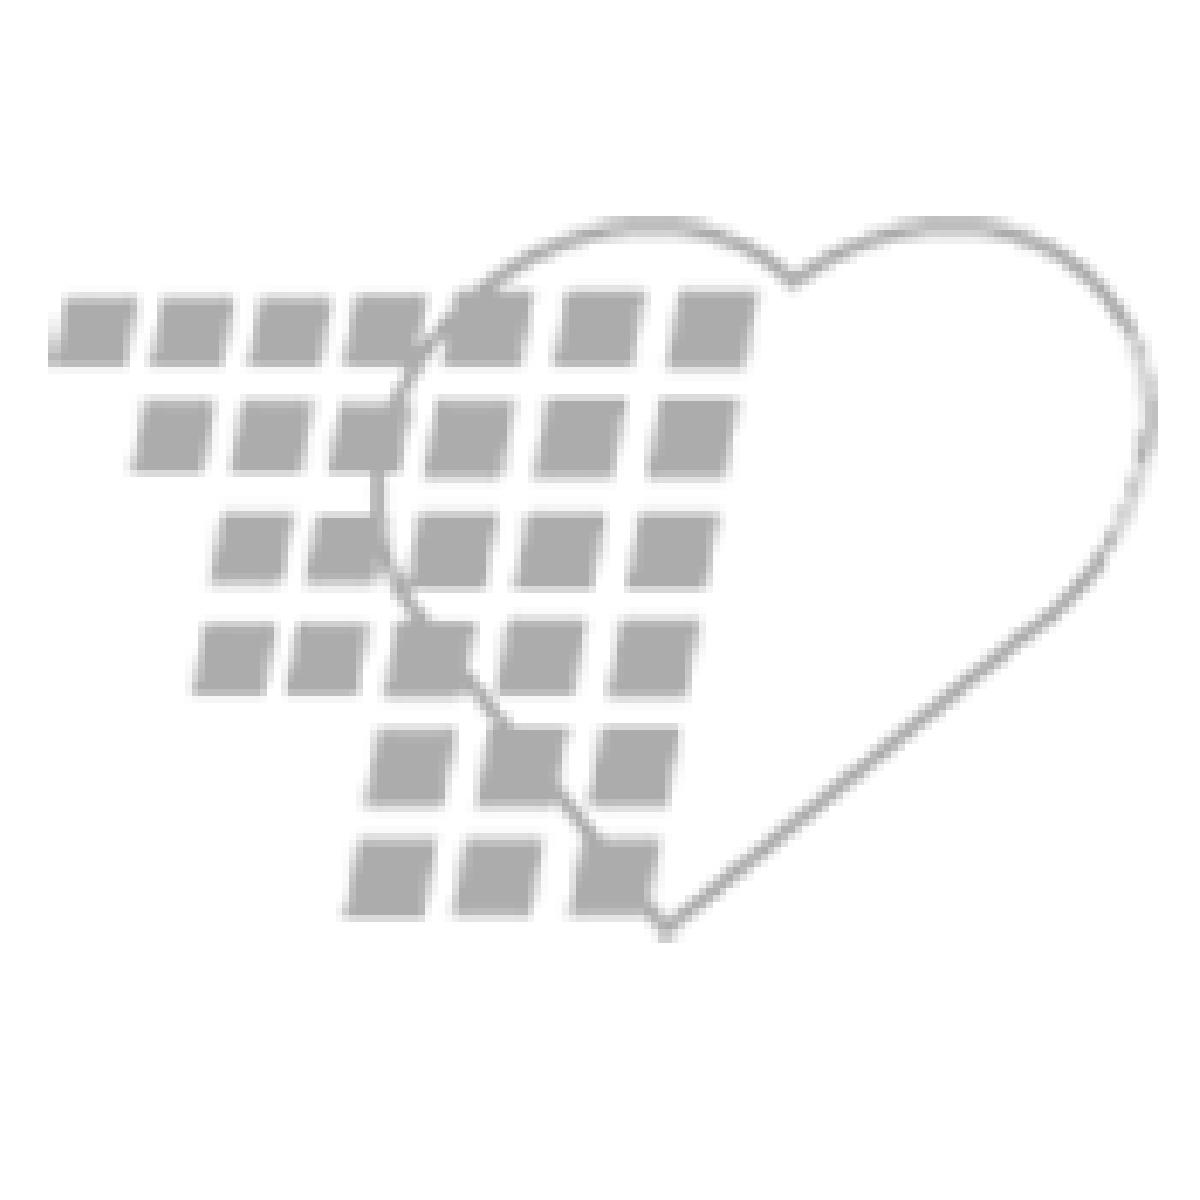 01-77-1091 First Responder Pin